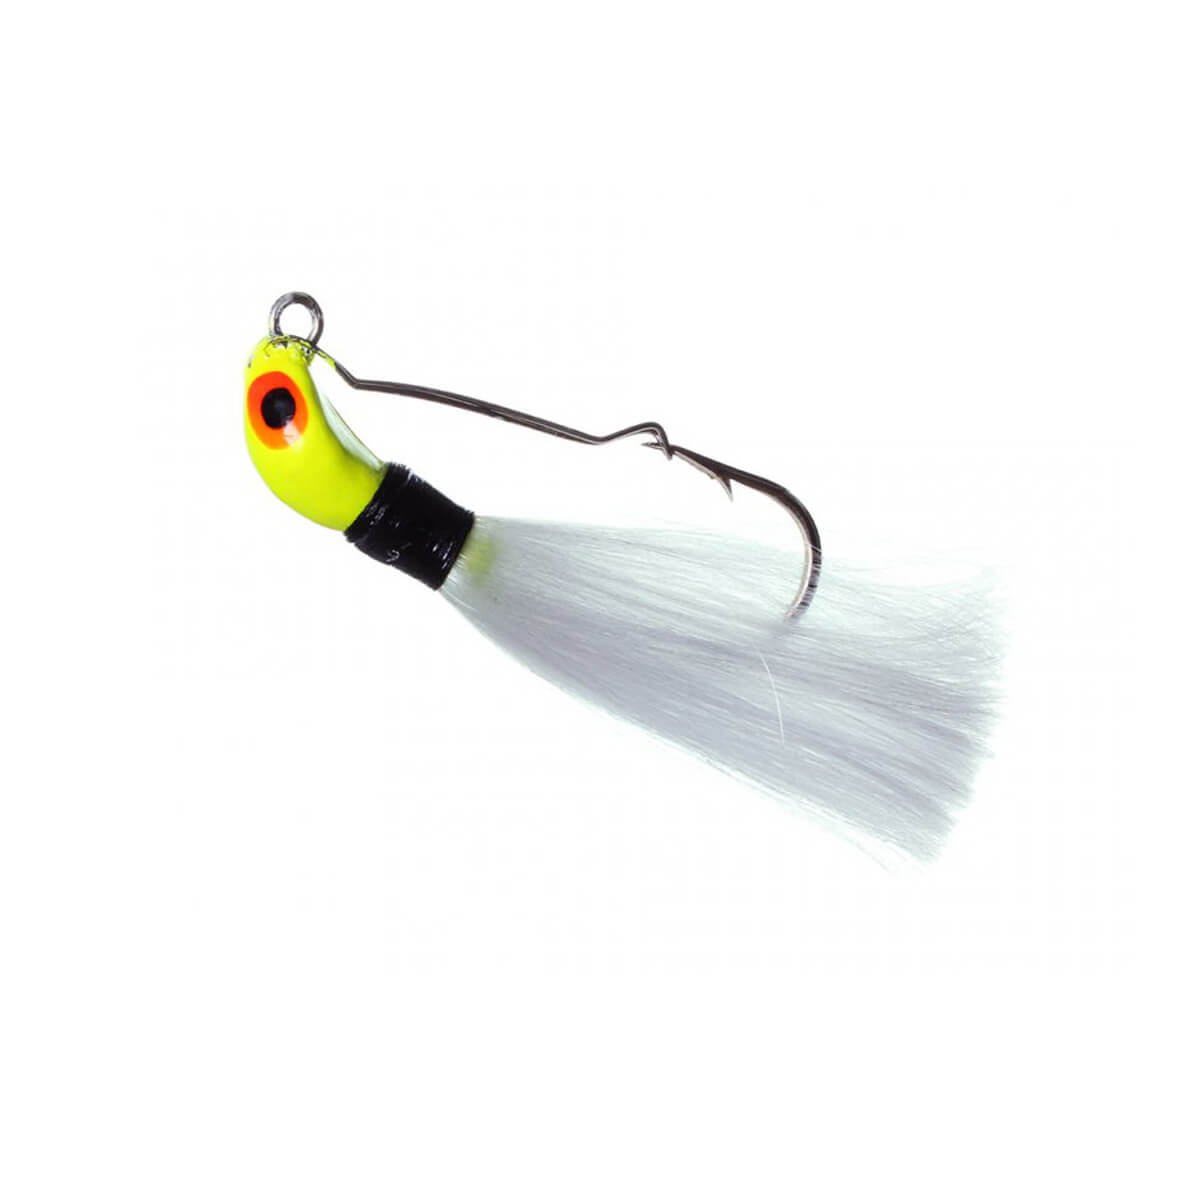 Jig Lori Antienrosco P 8 g  - Pró Pesca Shop